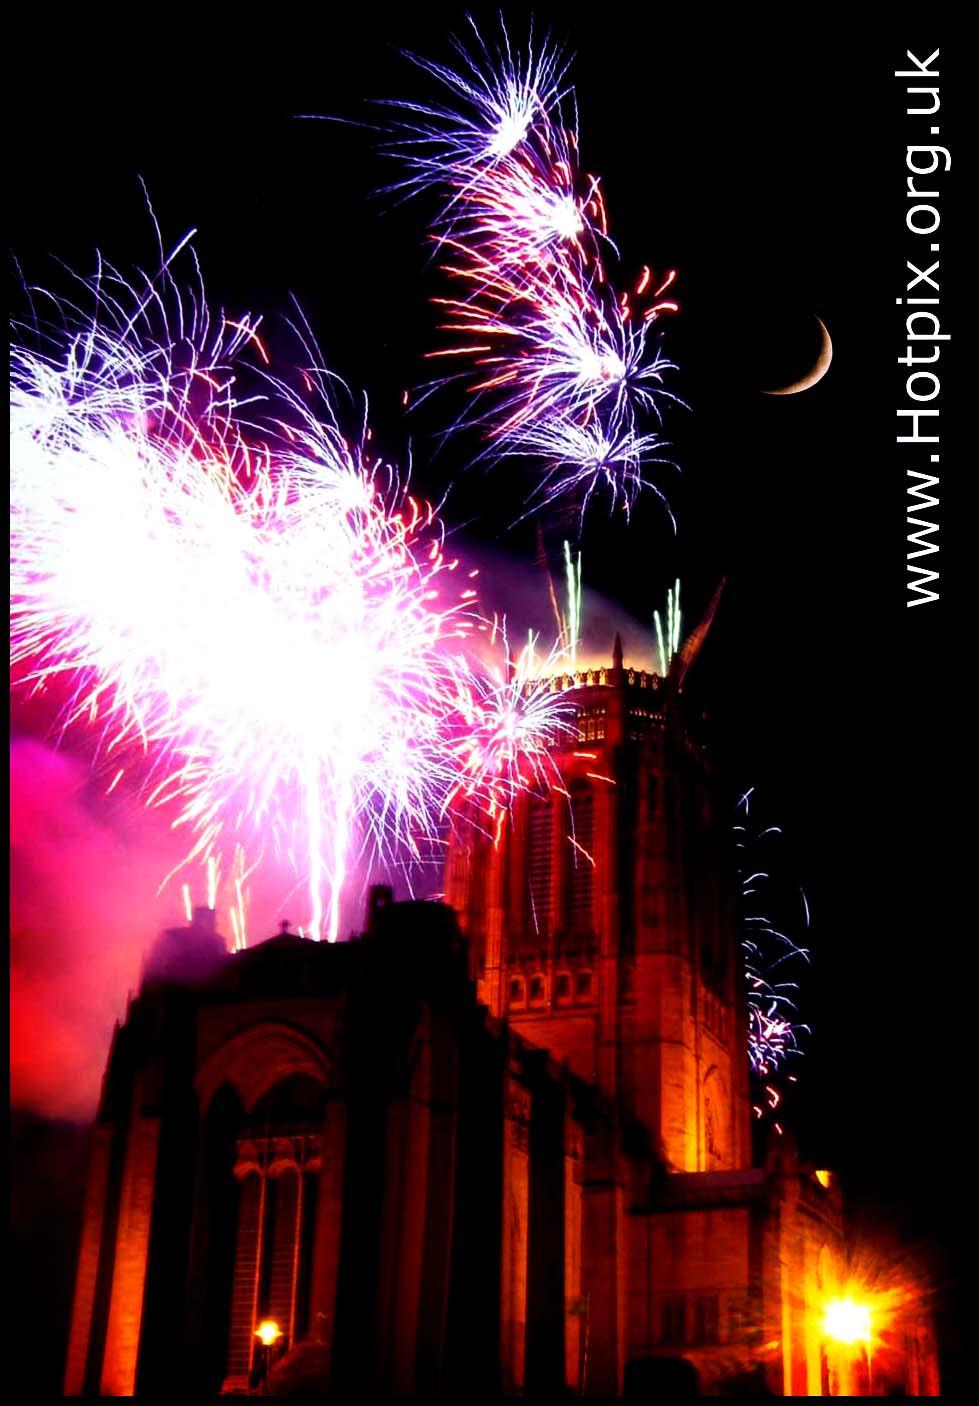 Liverpool,mersey,night,nights,shot,long,exposure,tony,smith,hotpix,tonysmith,tonysmithhotpix,light,stream,bonfire,rocket,rockets,#tonysmithotpix